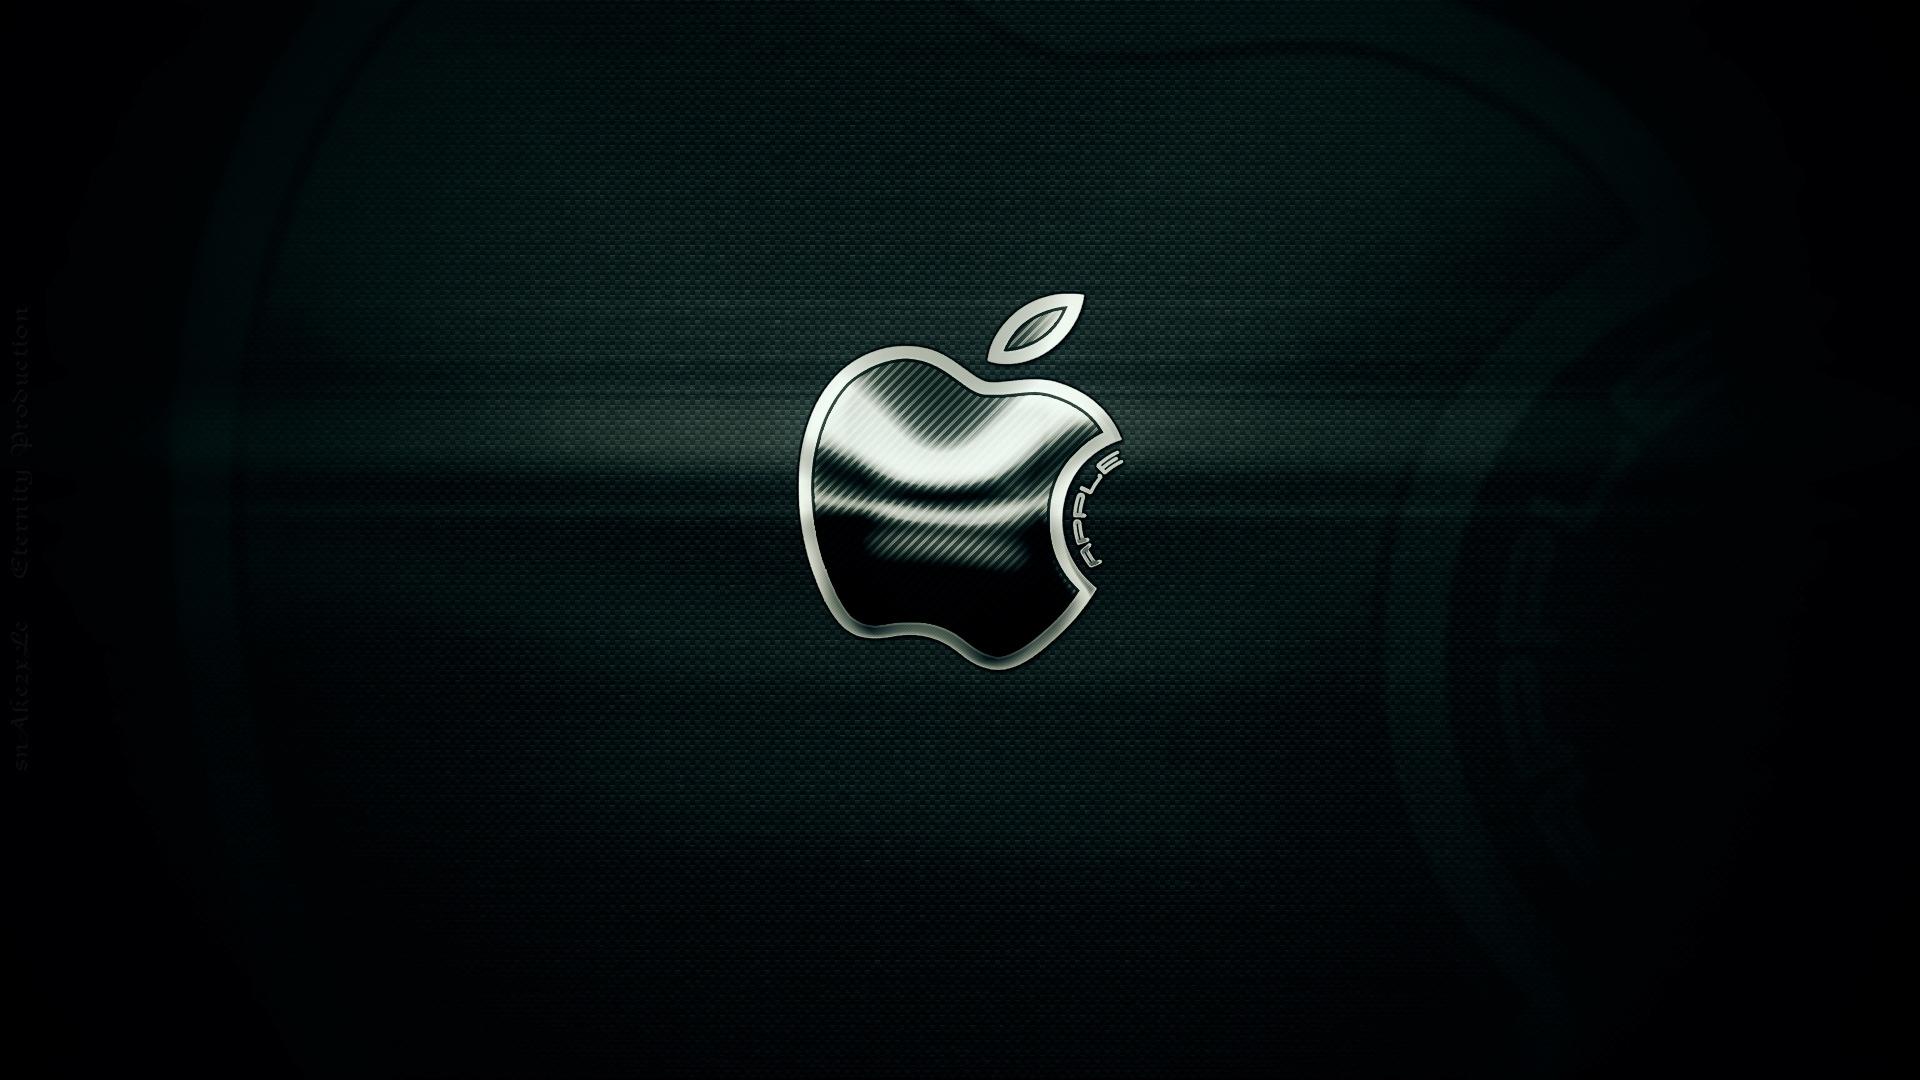 Apple Hd Wallpapers 1920x1080